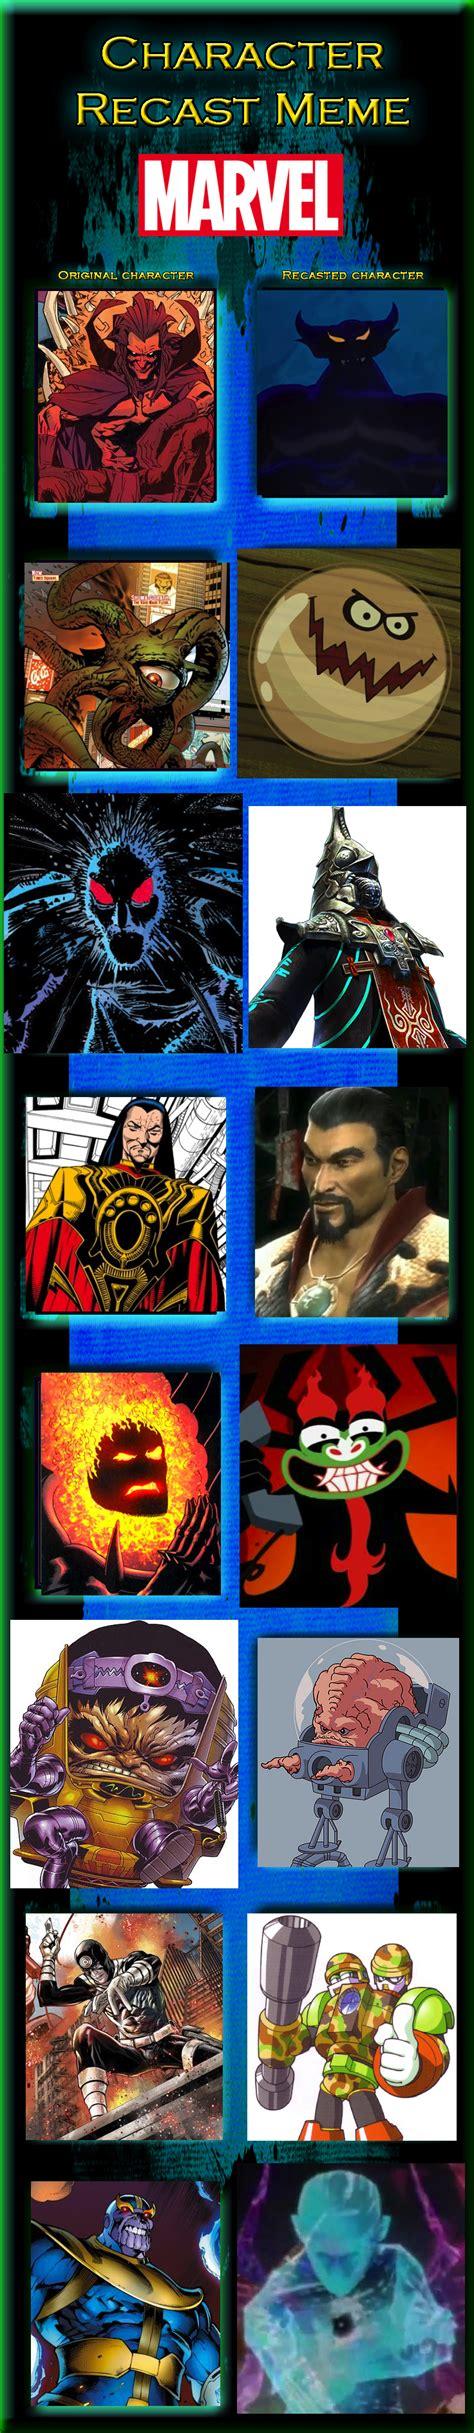 Meme Comic Characters - marvel comics character recast meme part 16 by